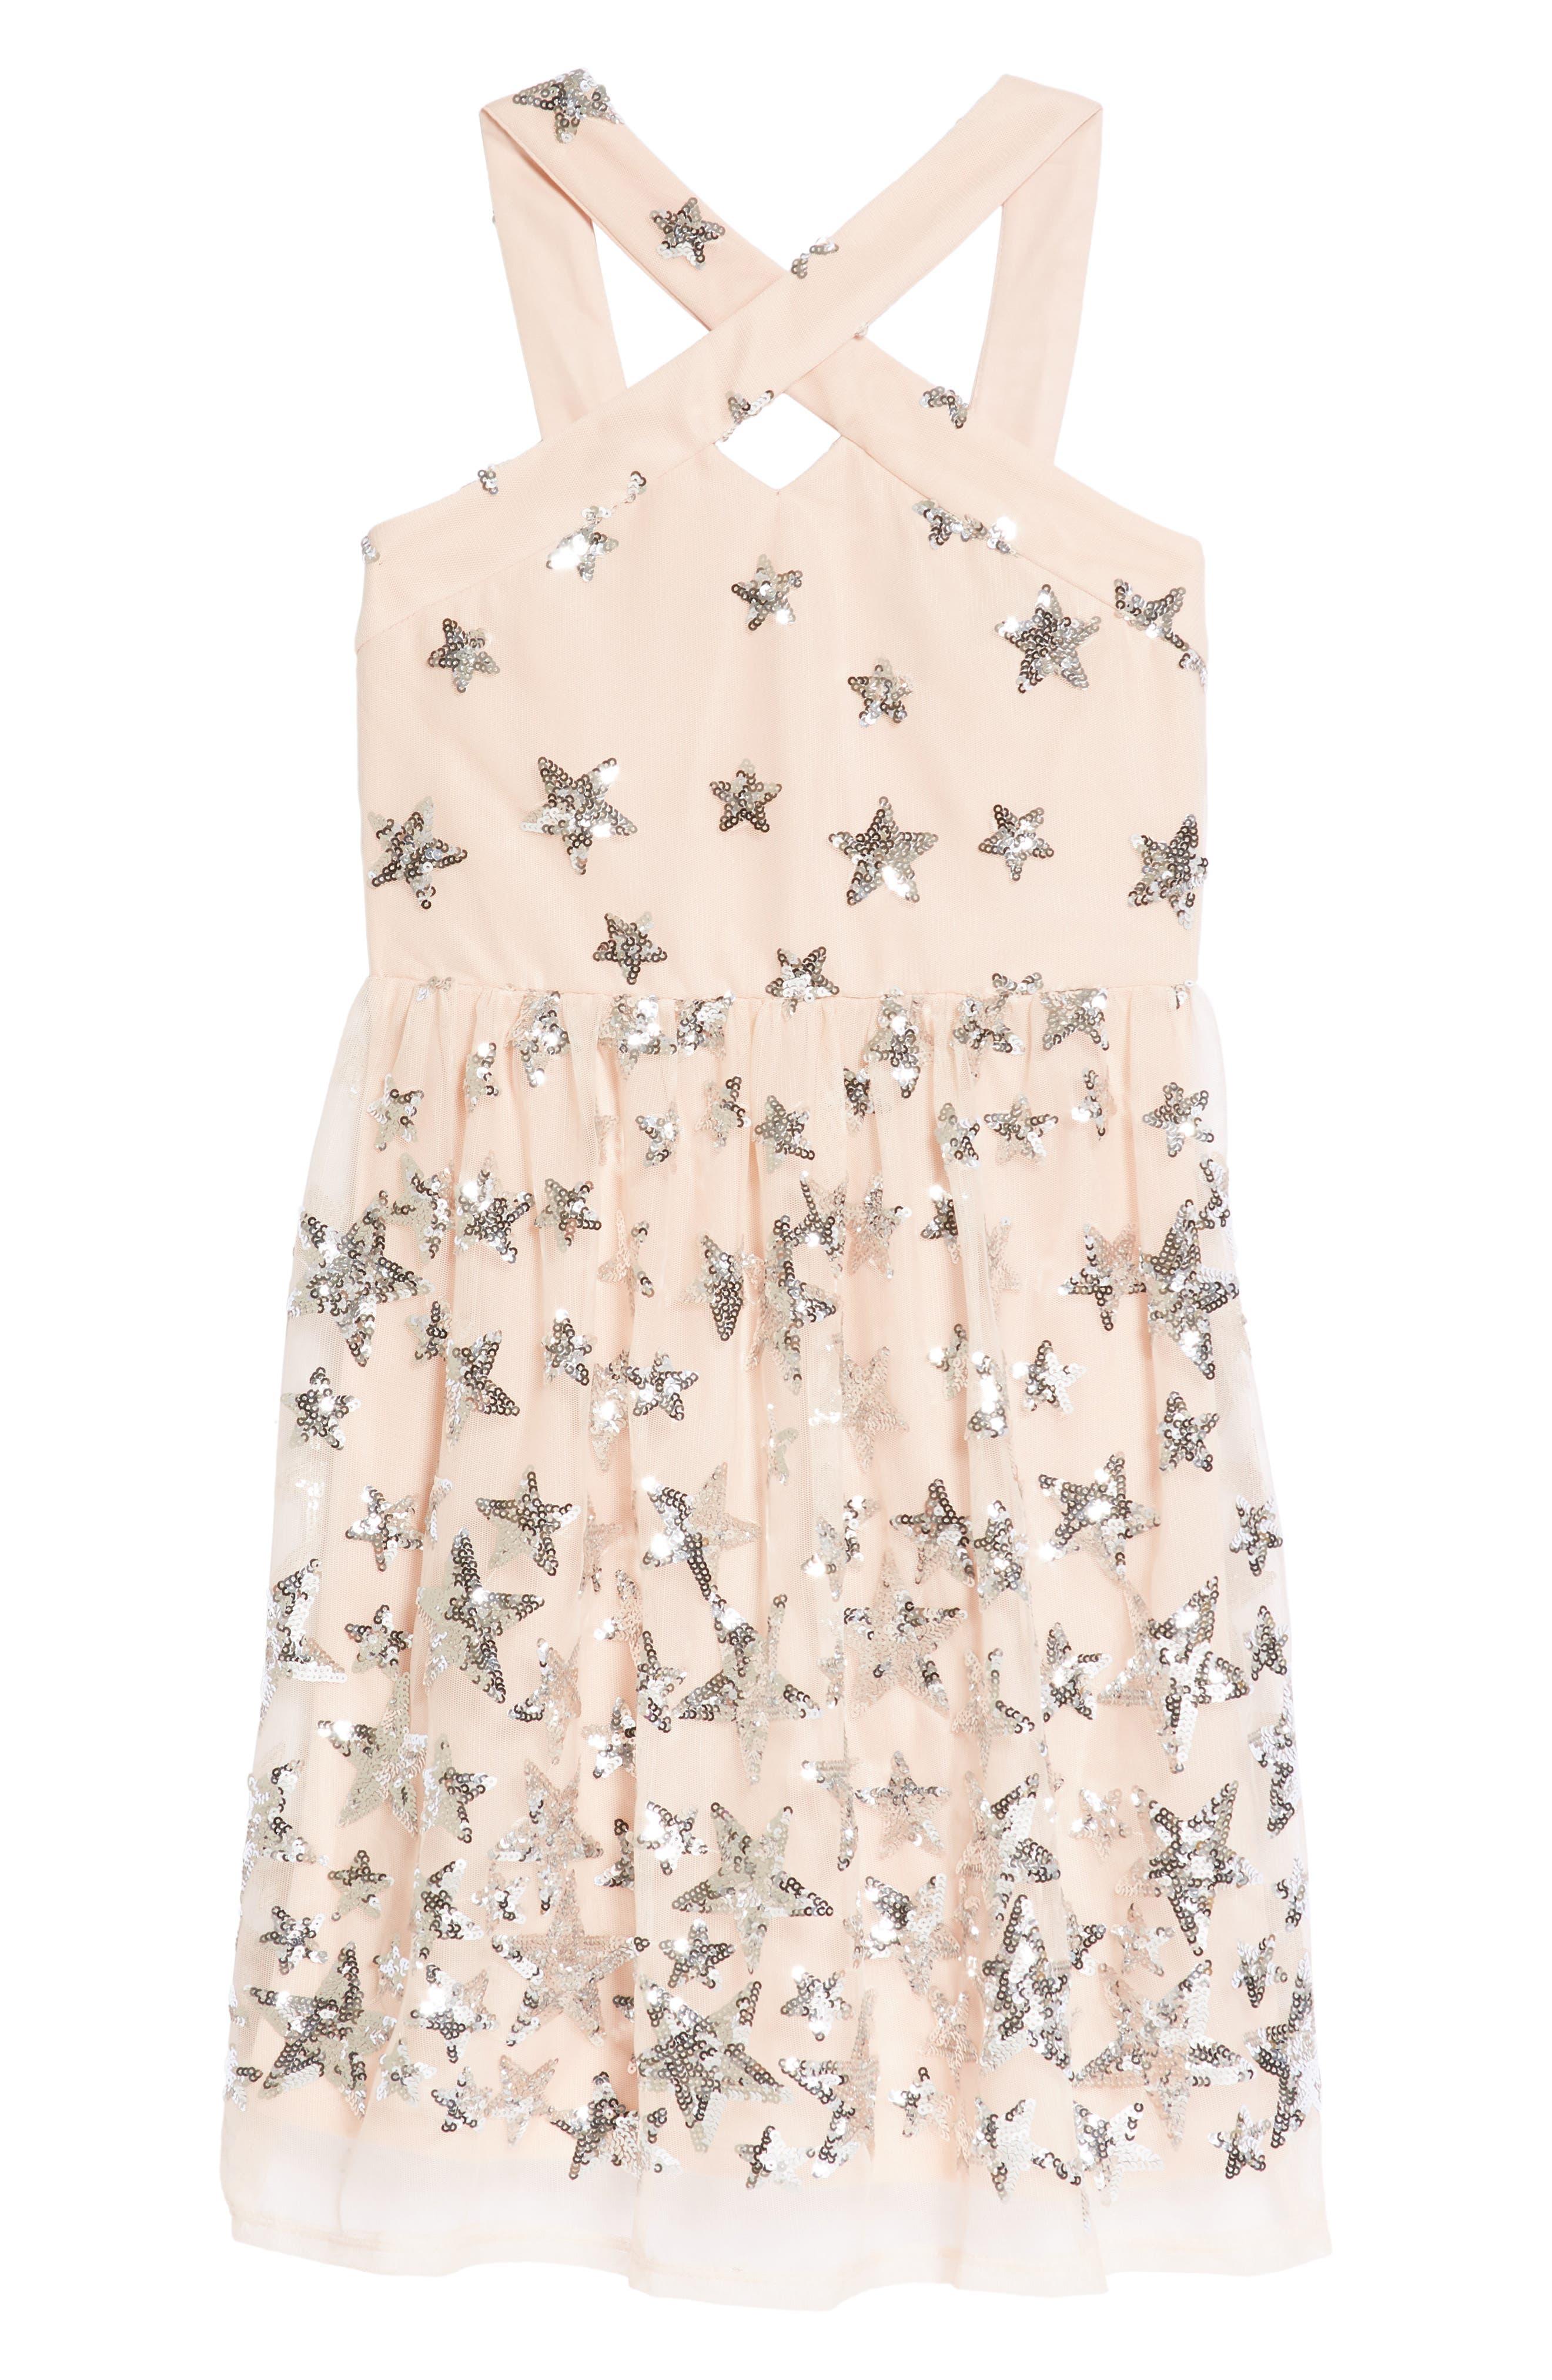 Sequin Embellished Star Party Dress,                         Main,                         color, 689